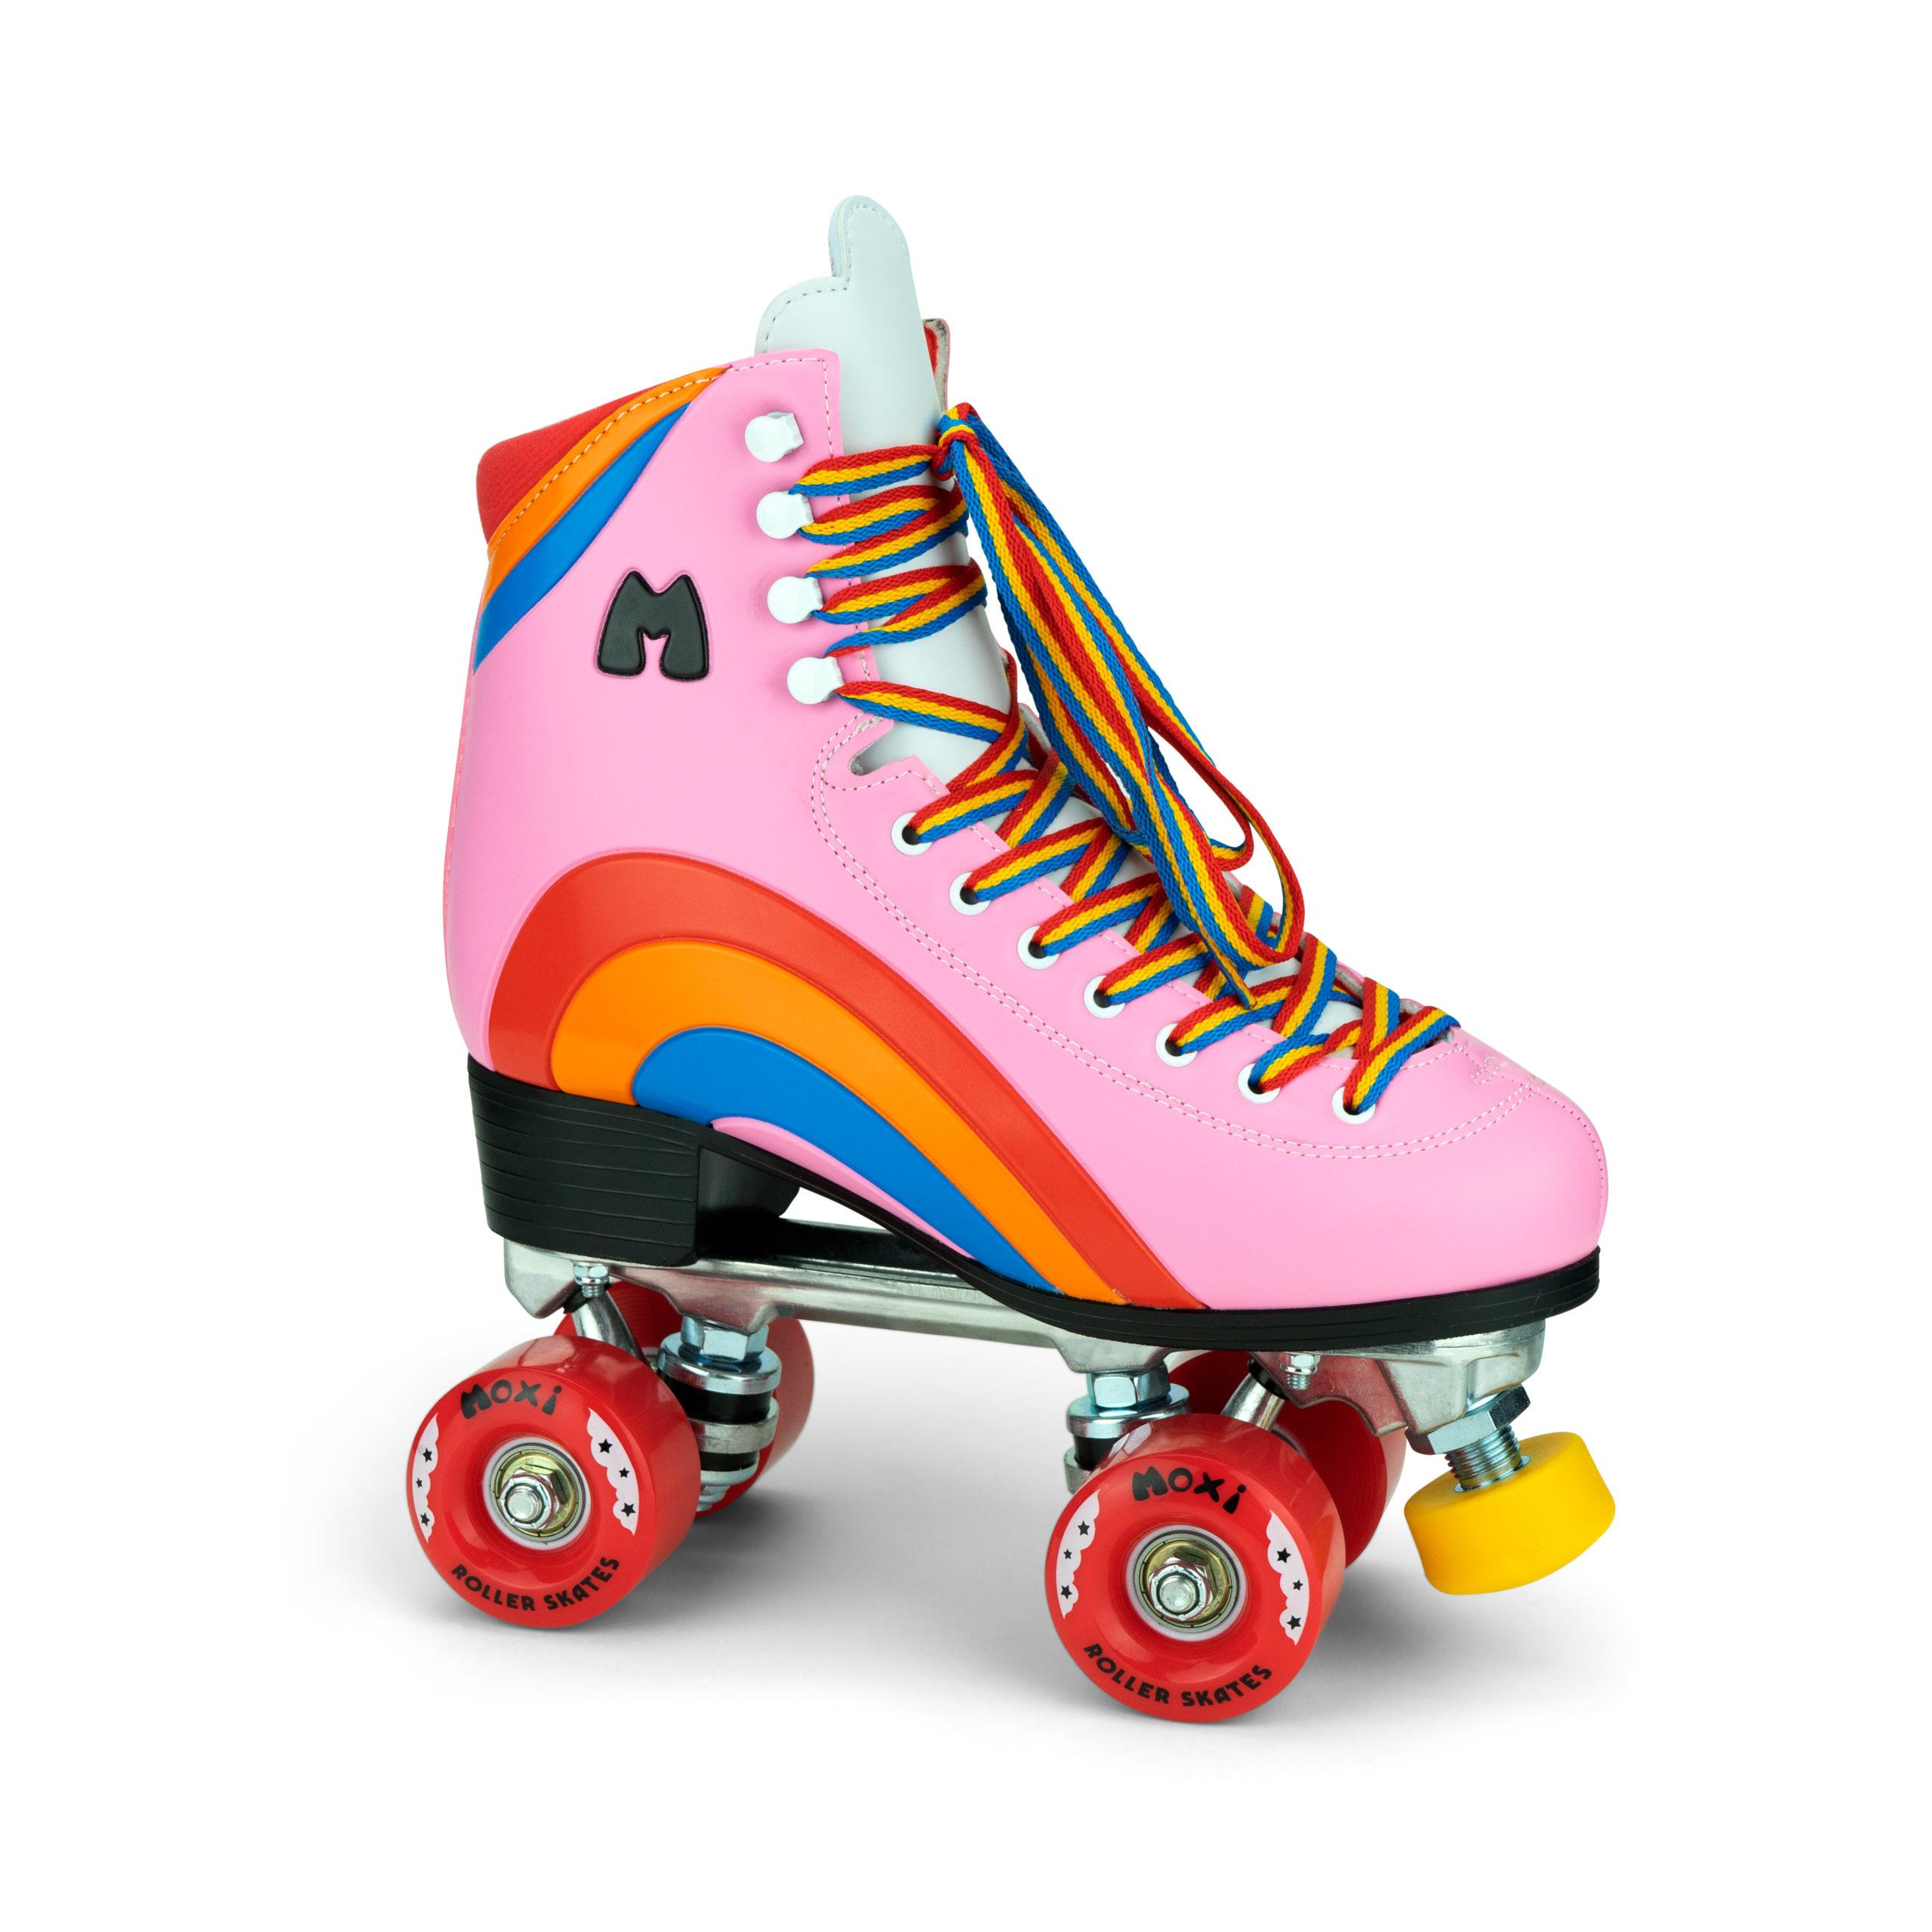 Moxi Rainbow Rider Roller Skates Bubblegum Pink.